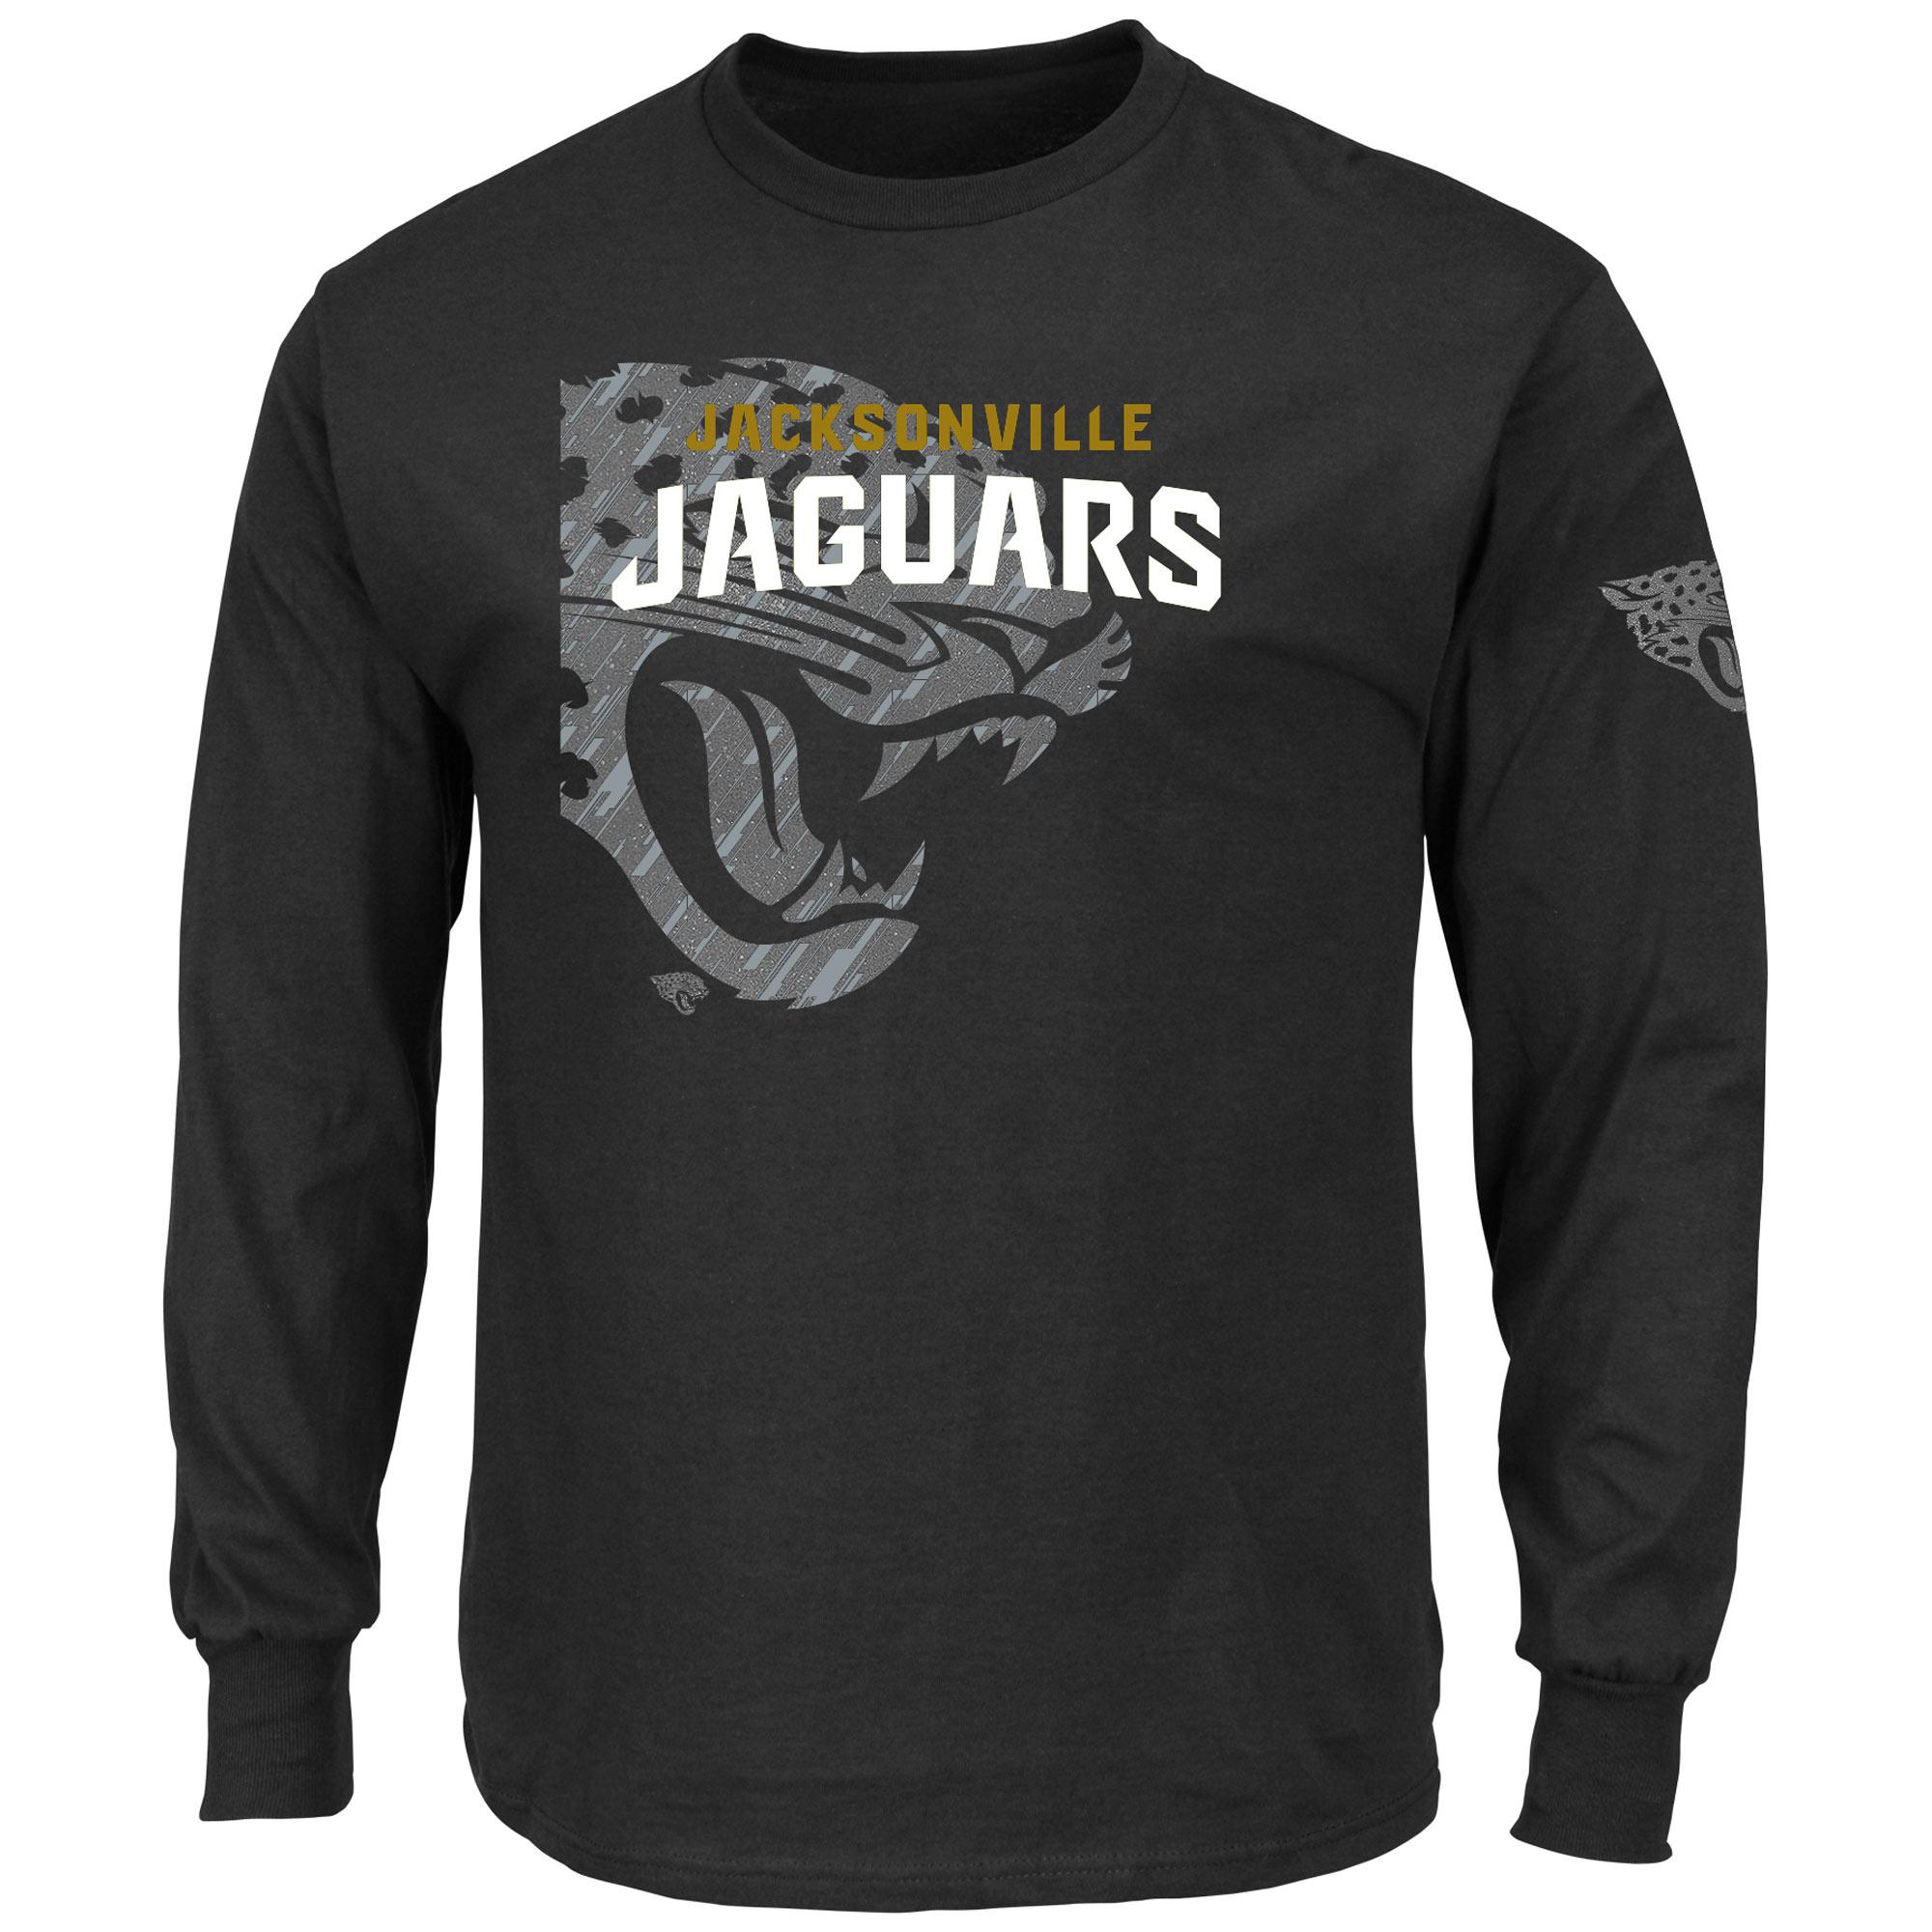 Jacksonville Jaguars Majestic Big & Tall Elite Reflective Long Sleeve T-Shirt - Black